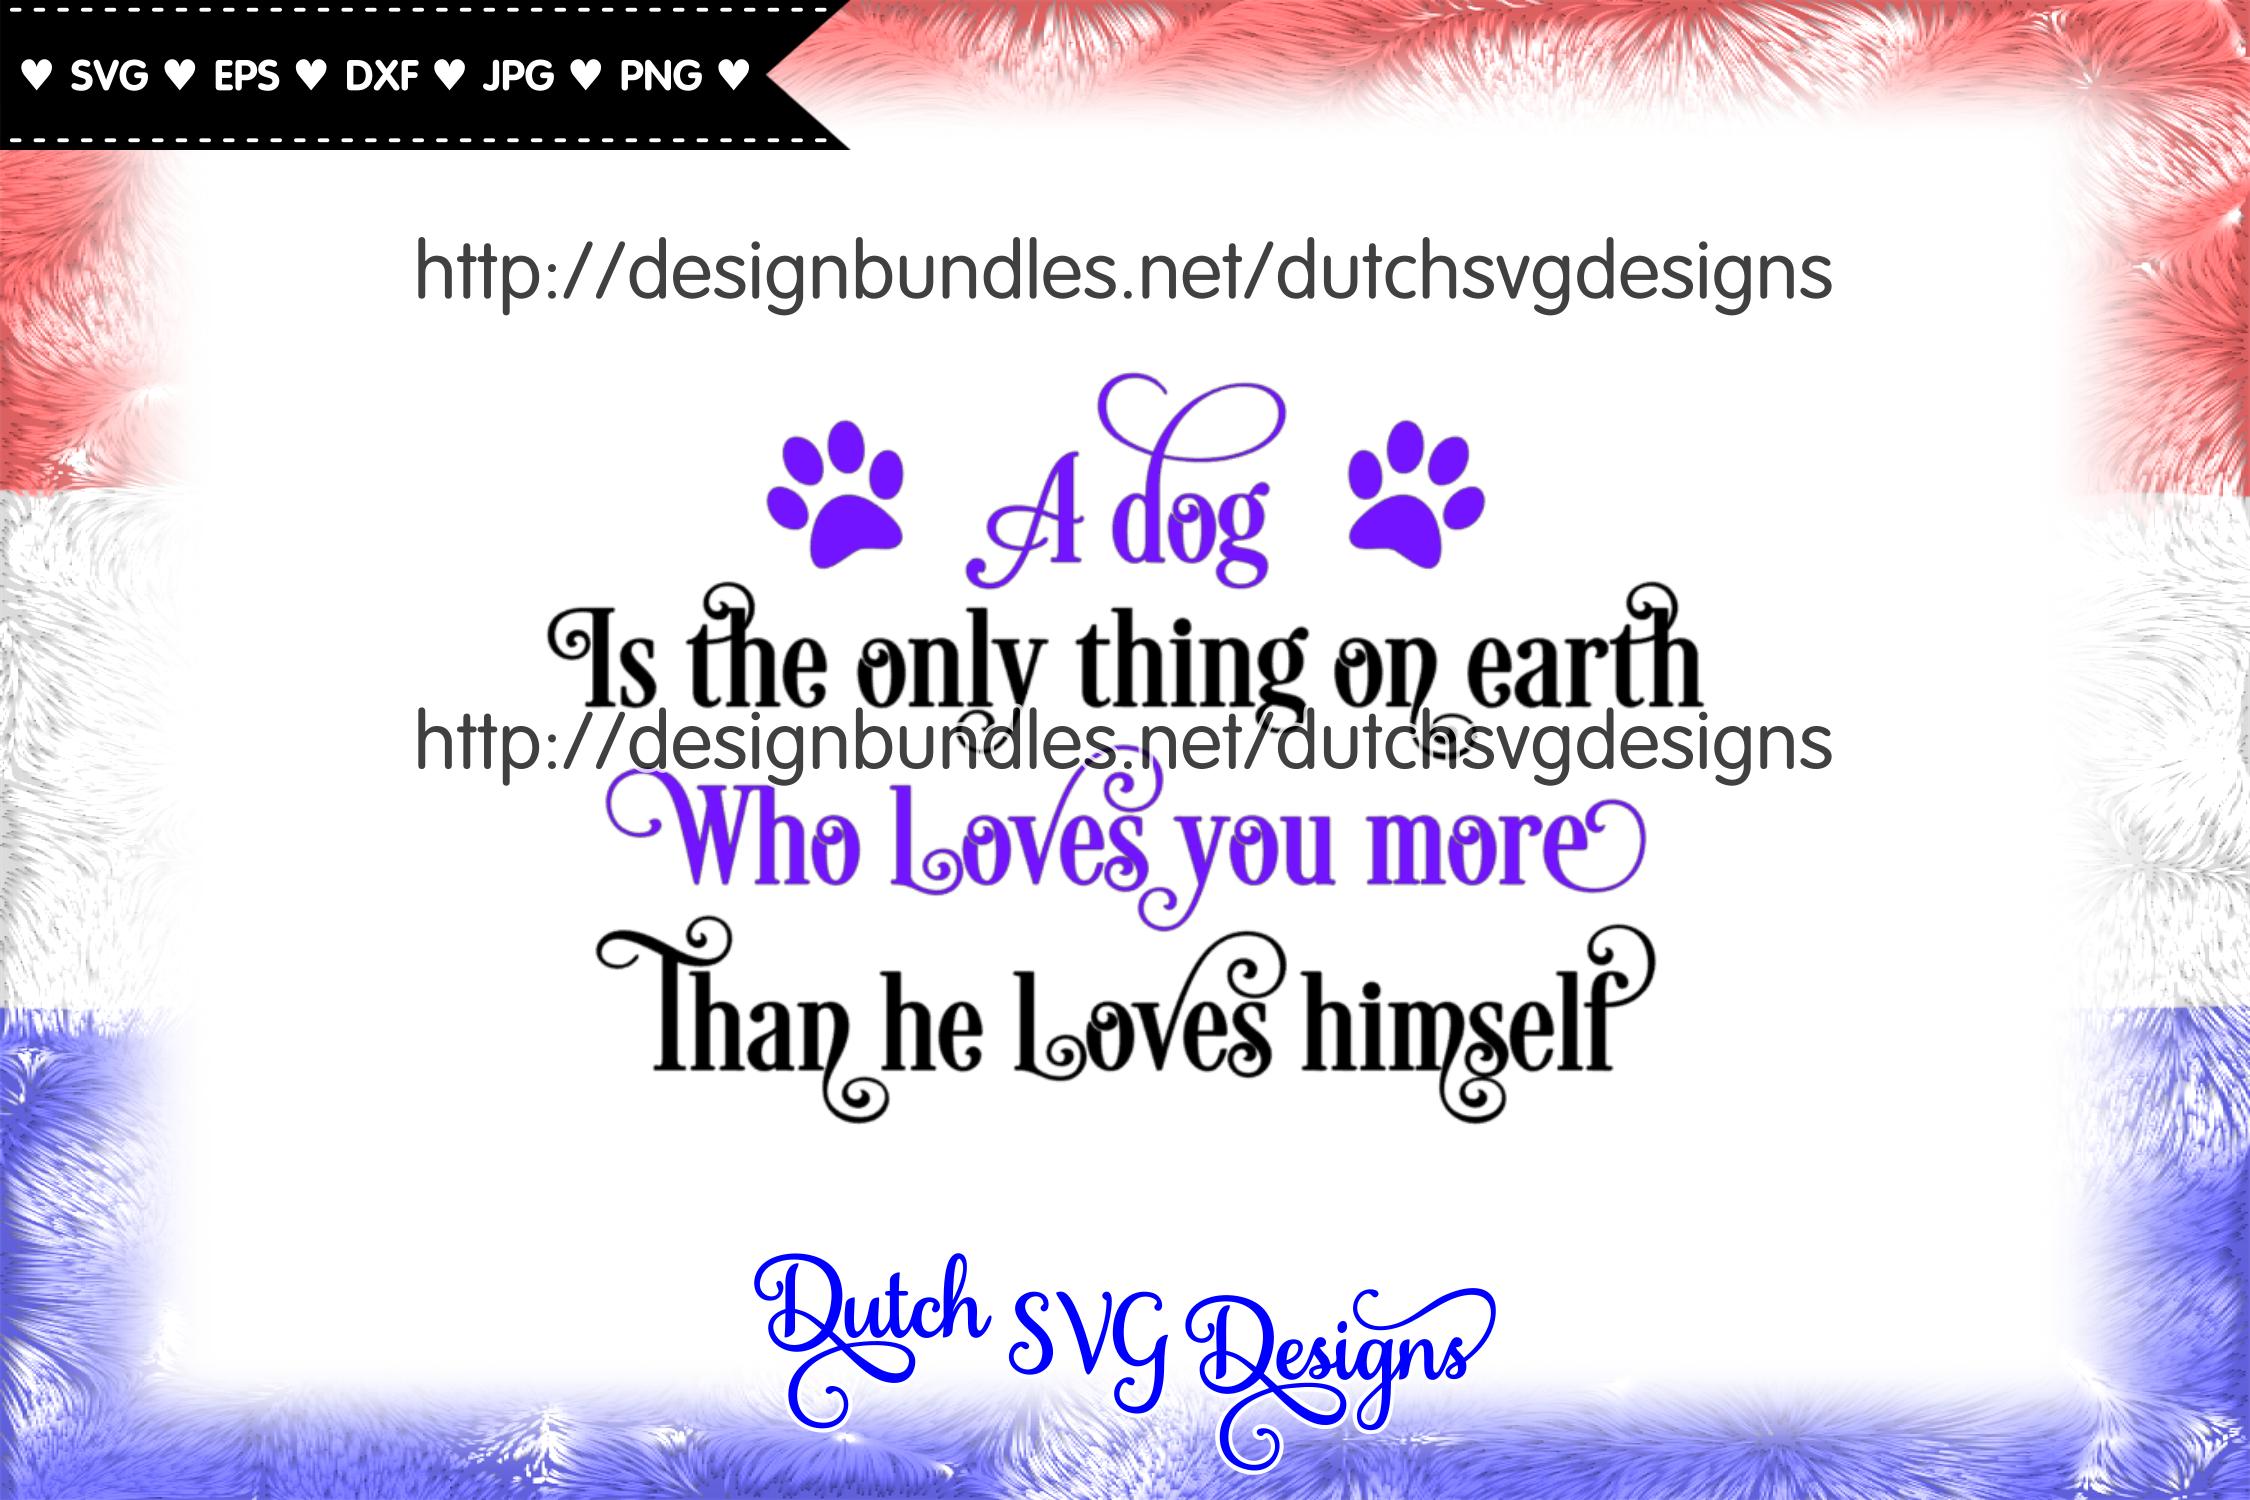 Dog text cut file, dog svg, dog cutting file, dog cut file example image 2